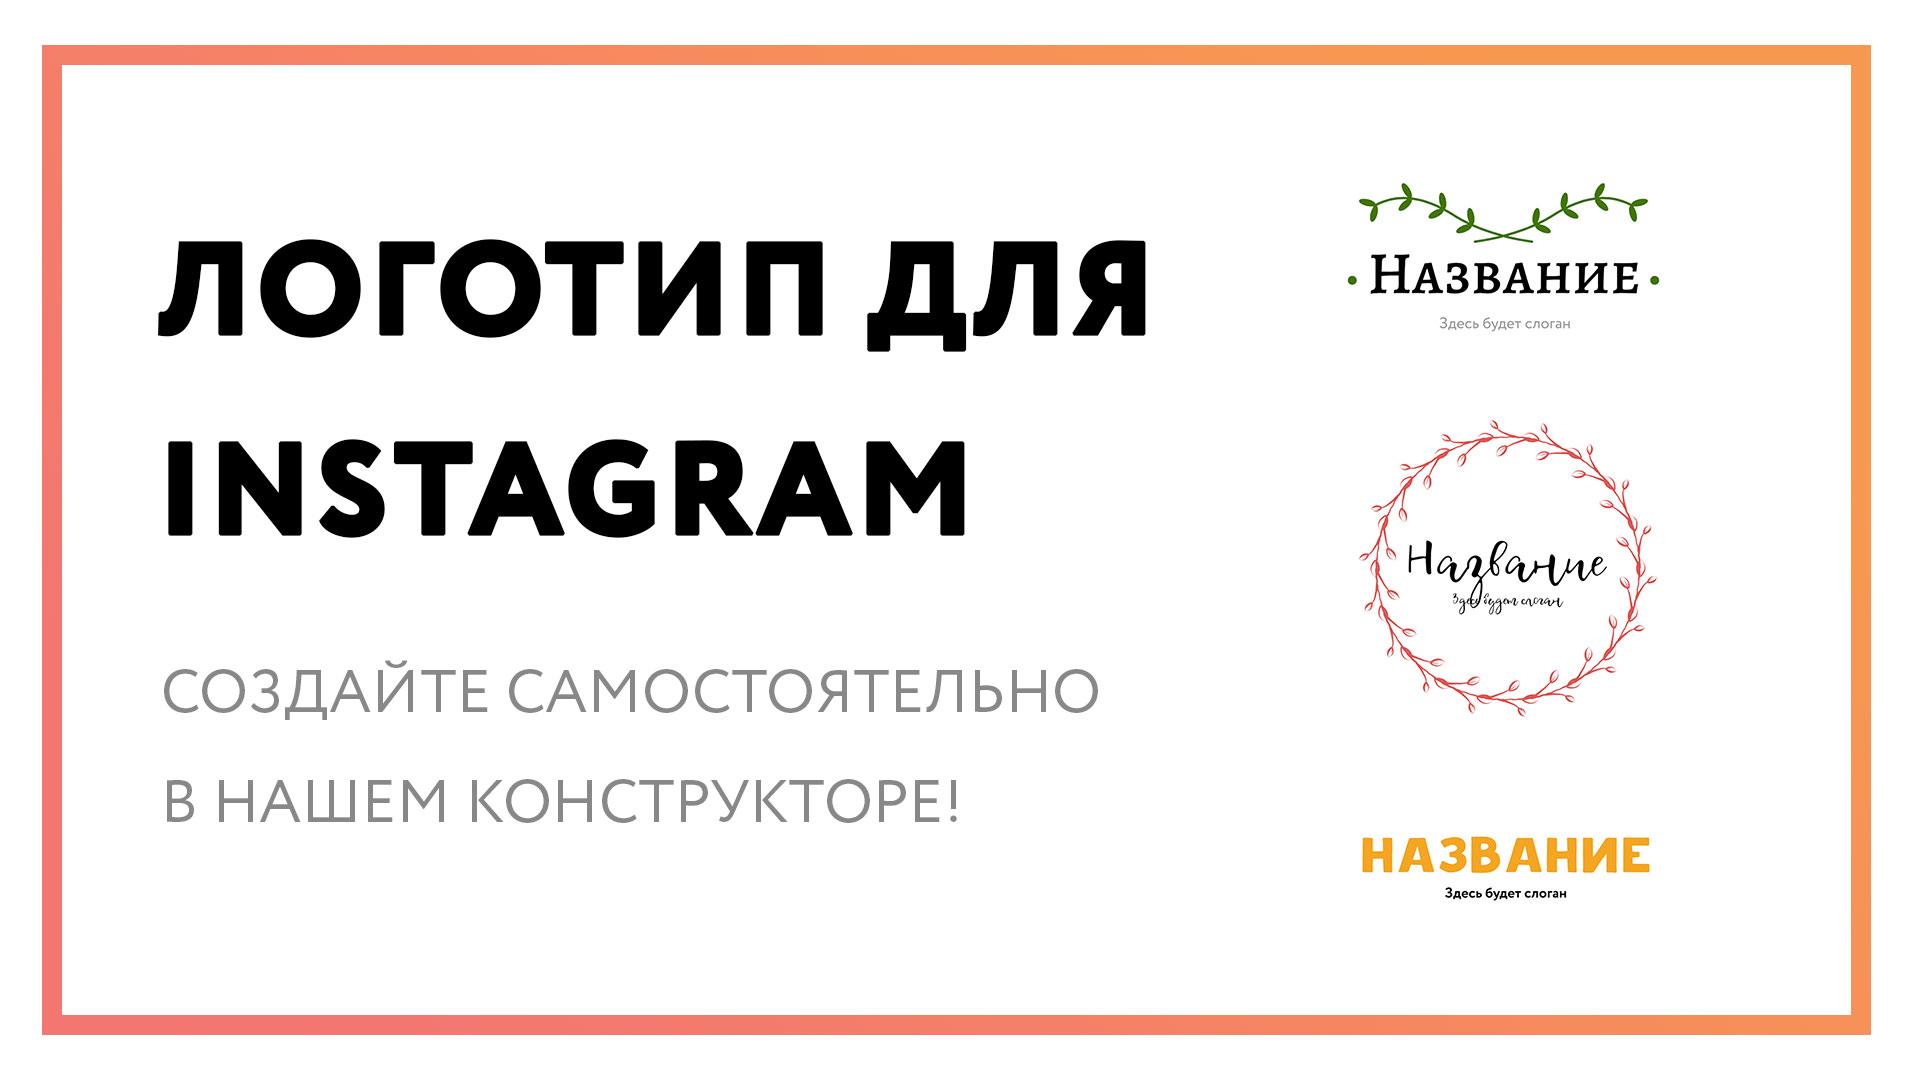 логотип-для-инстграм-создайте-онлайн.jpg